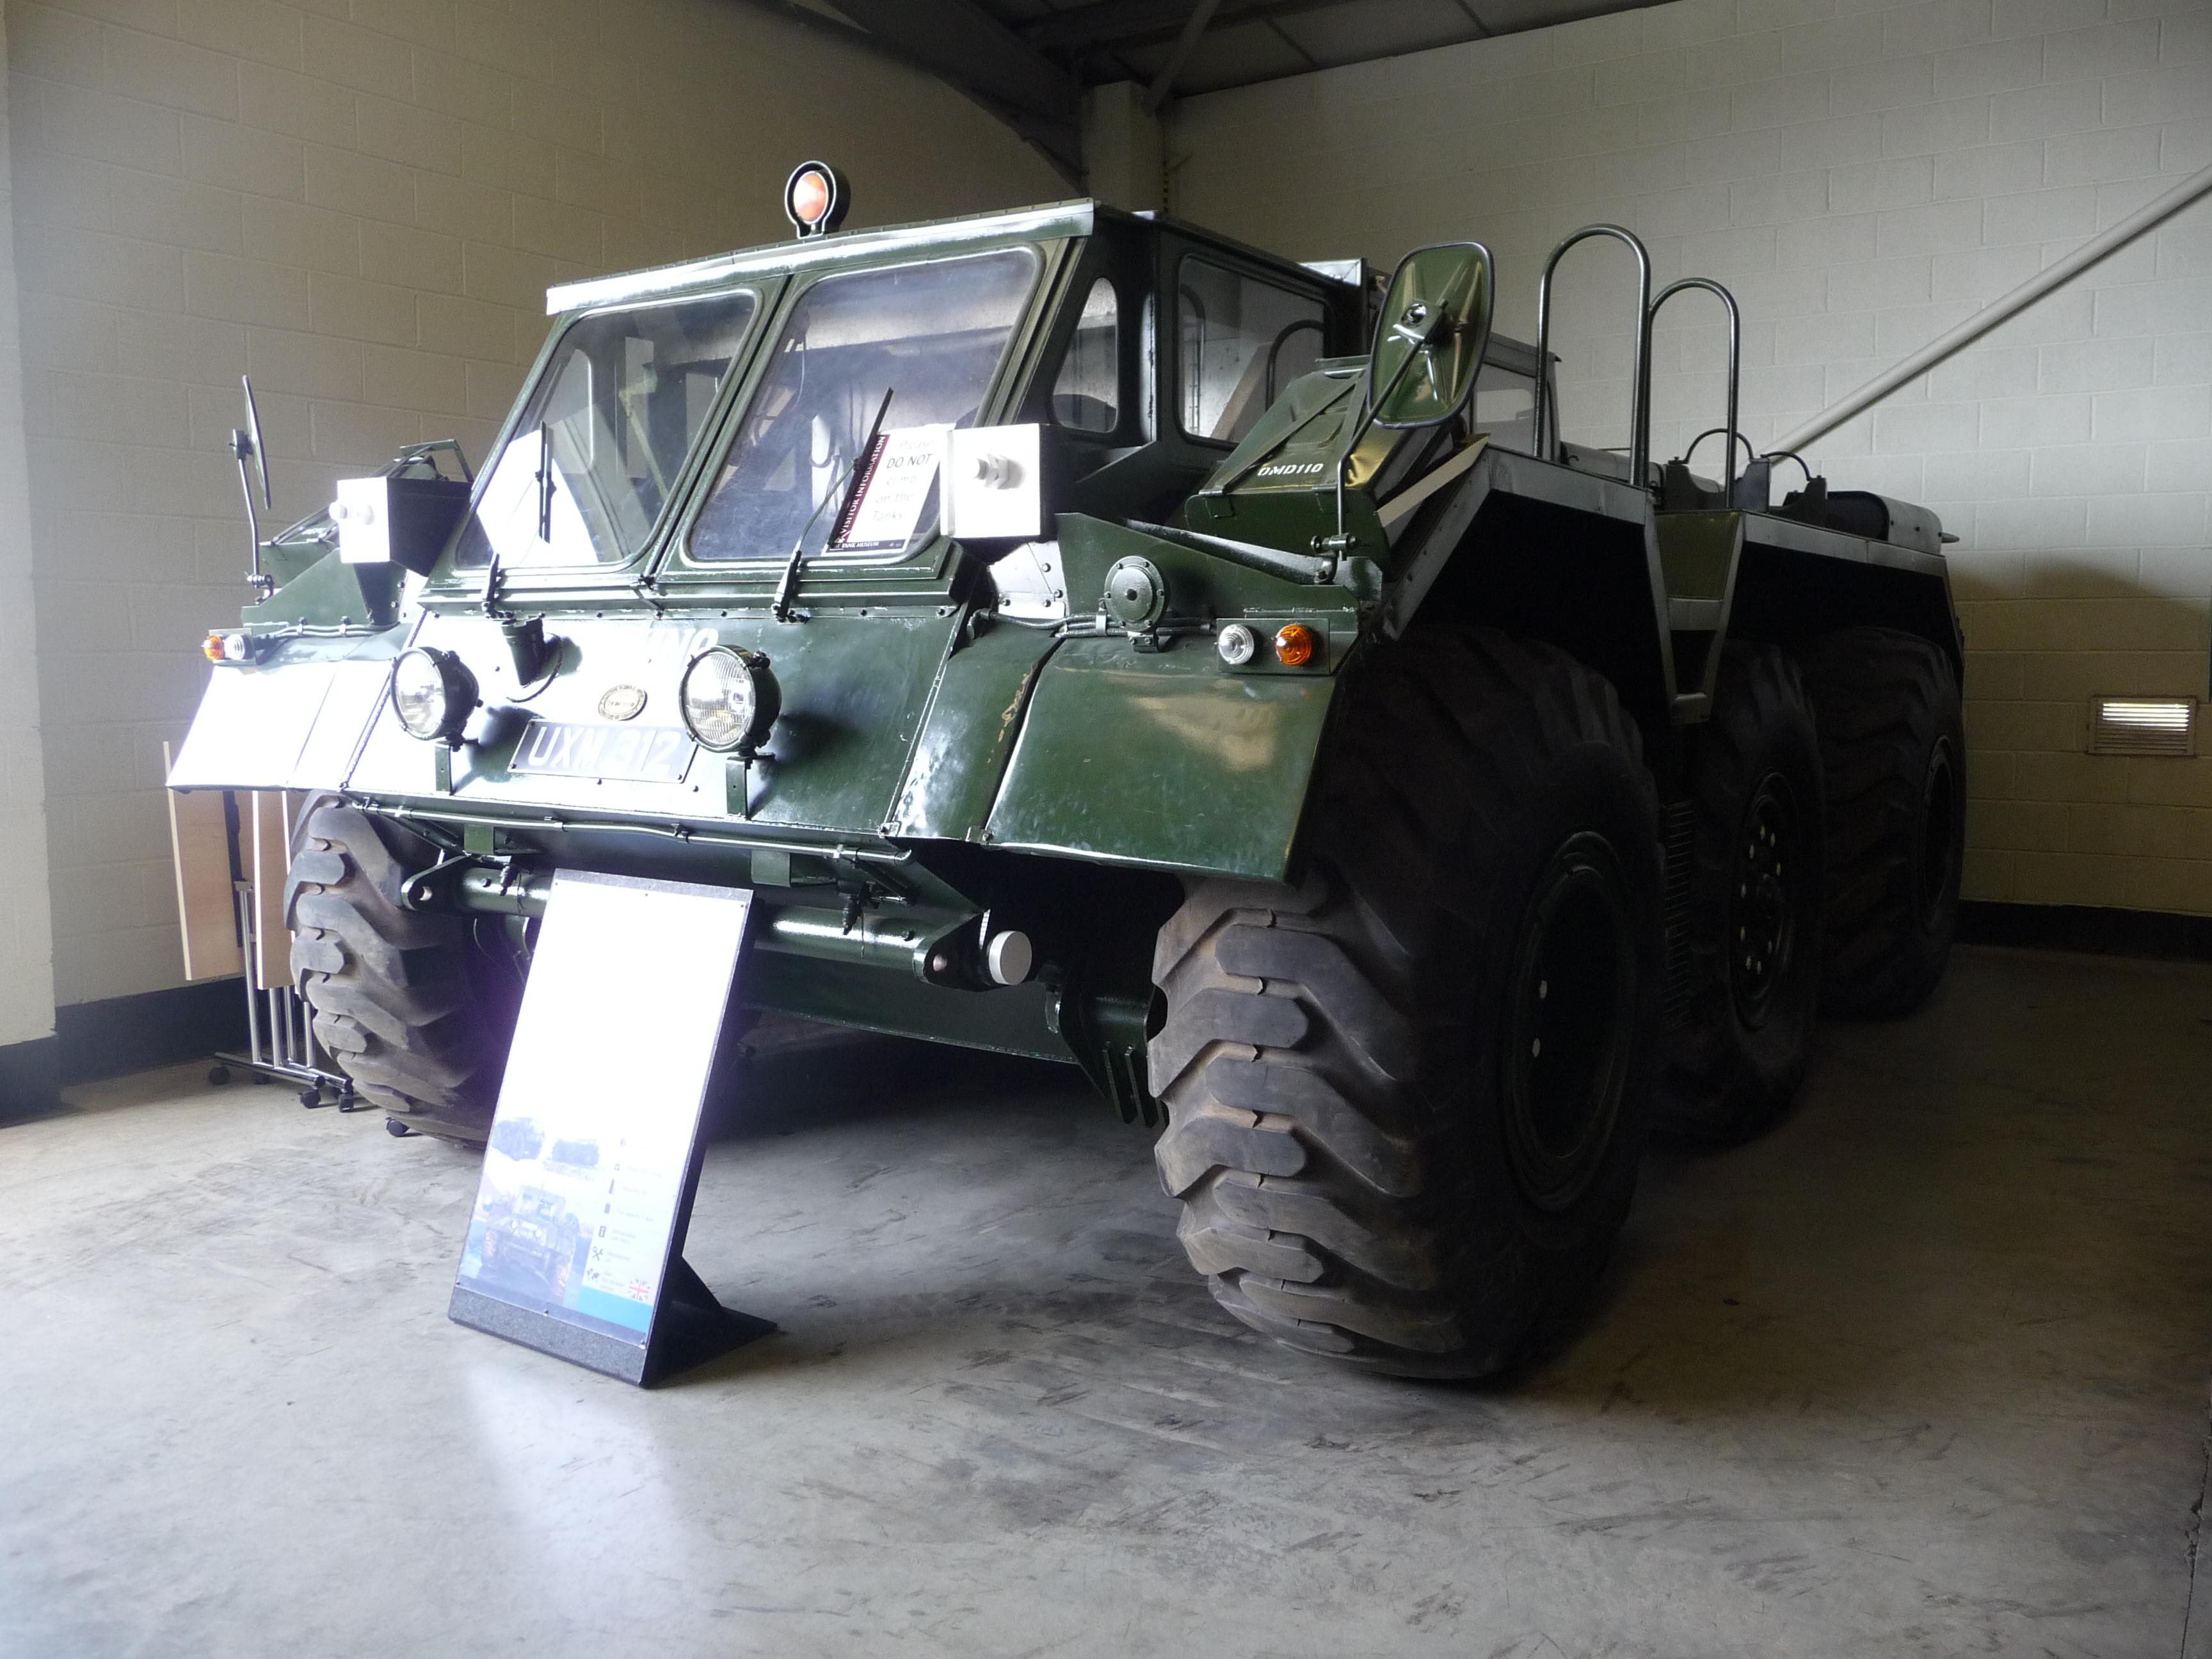 TV1000_Rhino%2C_Bovington_Tank_Museum.jp